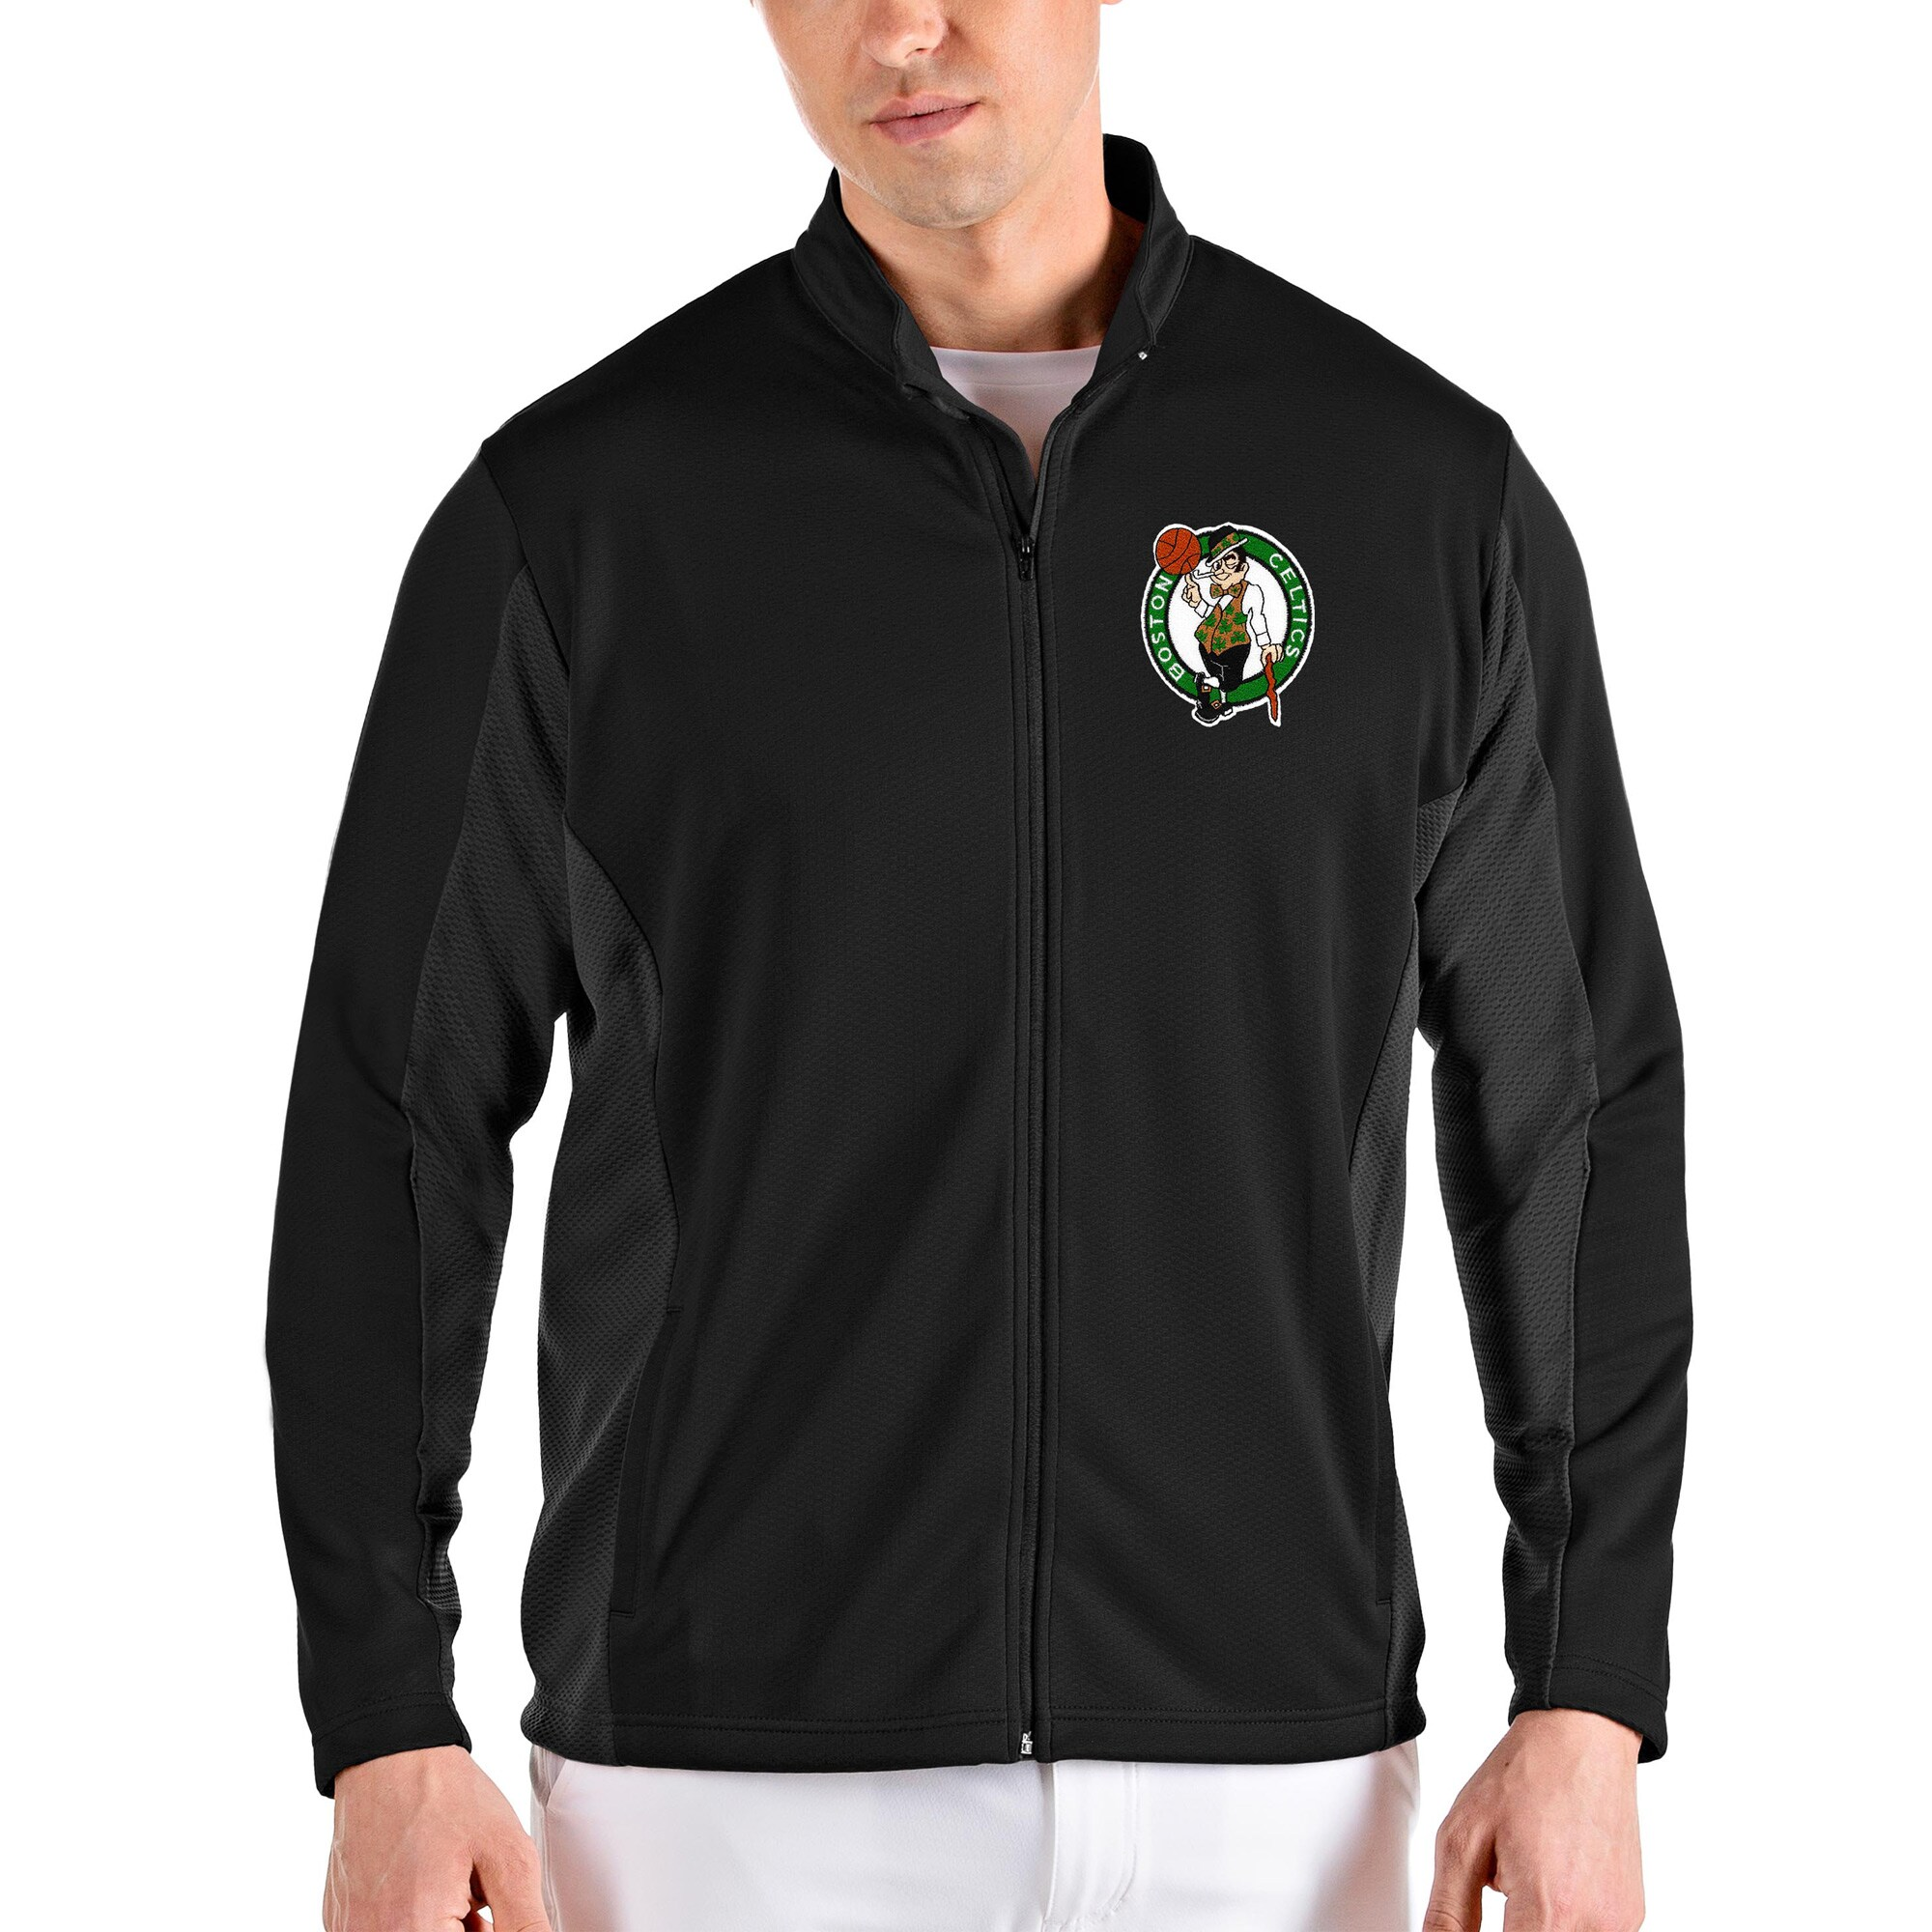 Boston Celtics Antigua Passage Full-Zip Jacket - Black/Gray